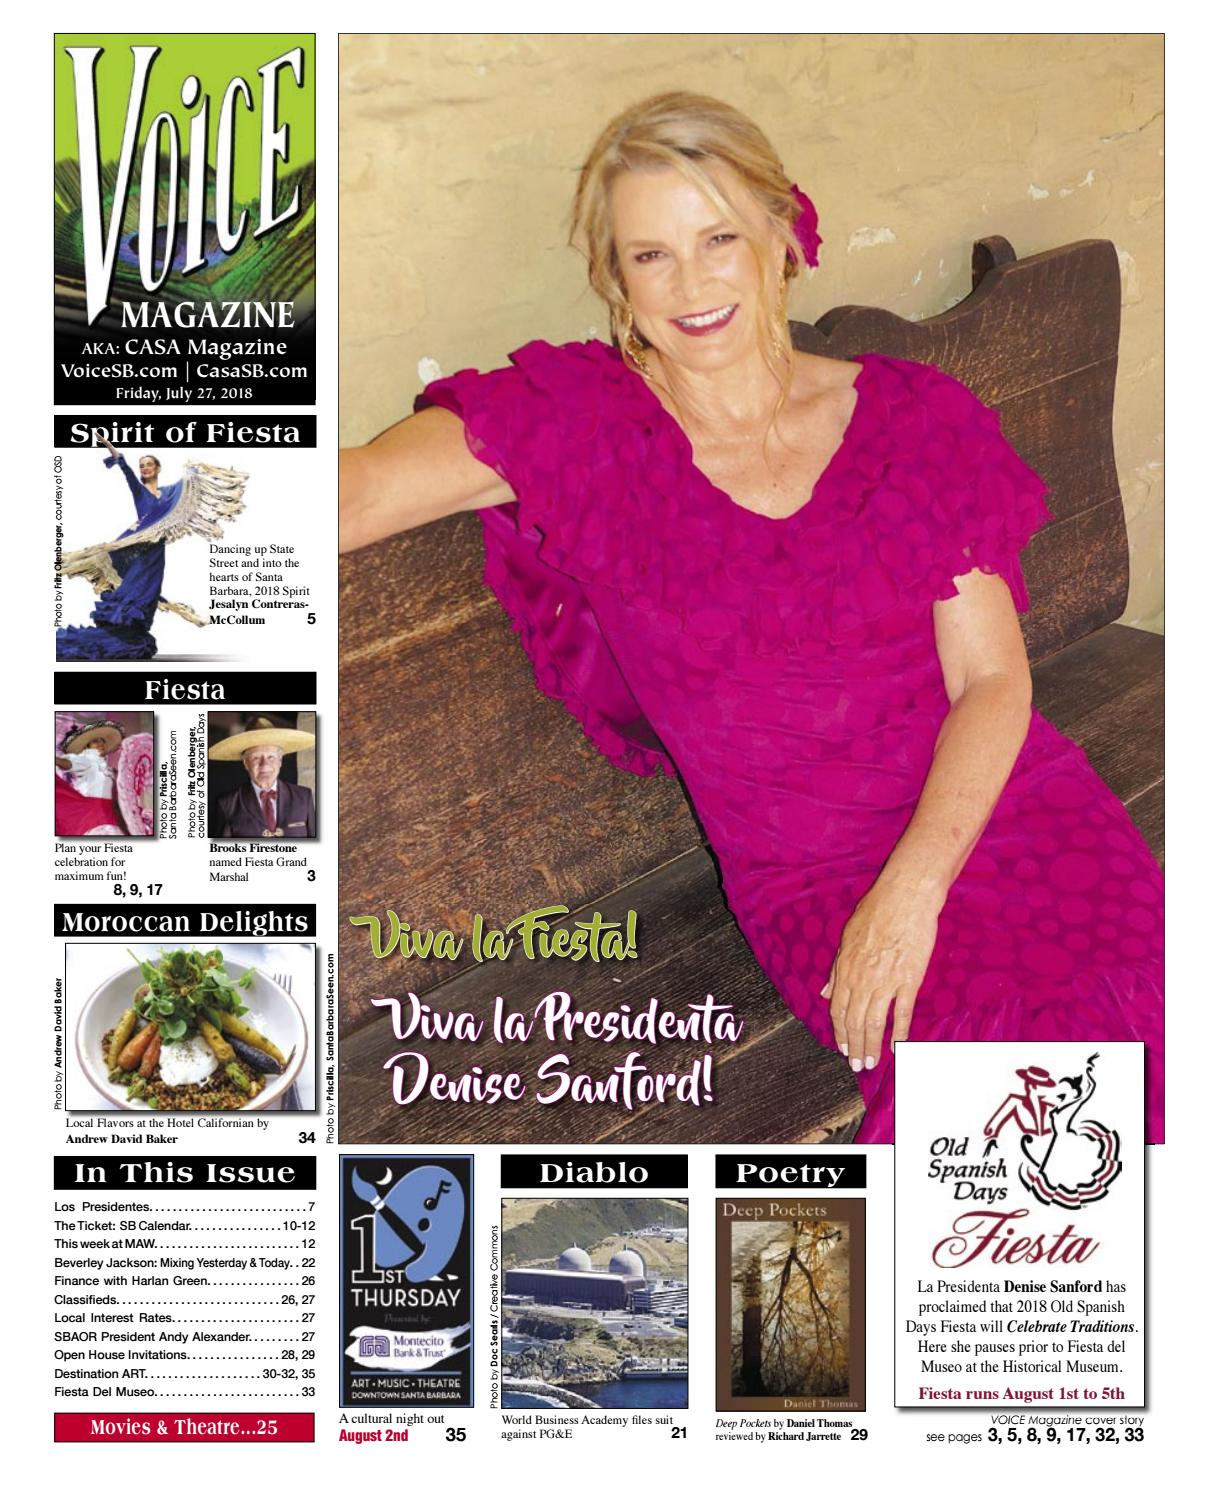 VOICE Magazine: July 27, 2018 by Voice Magazine / CASA - issuu